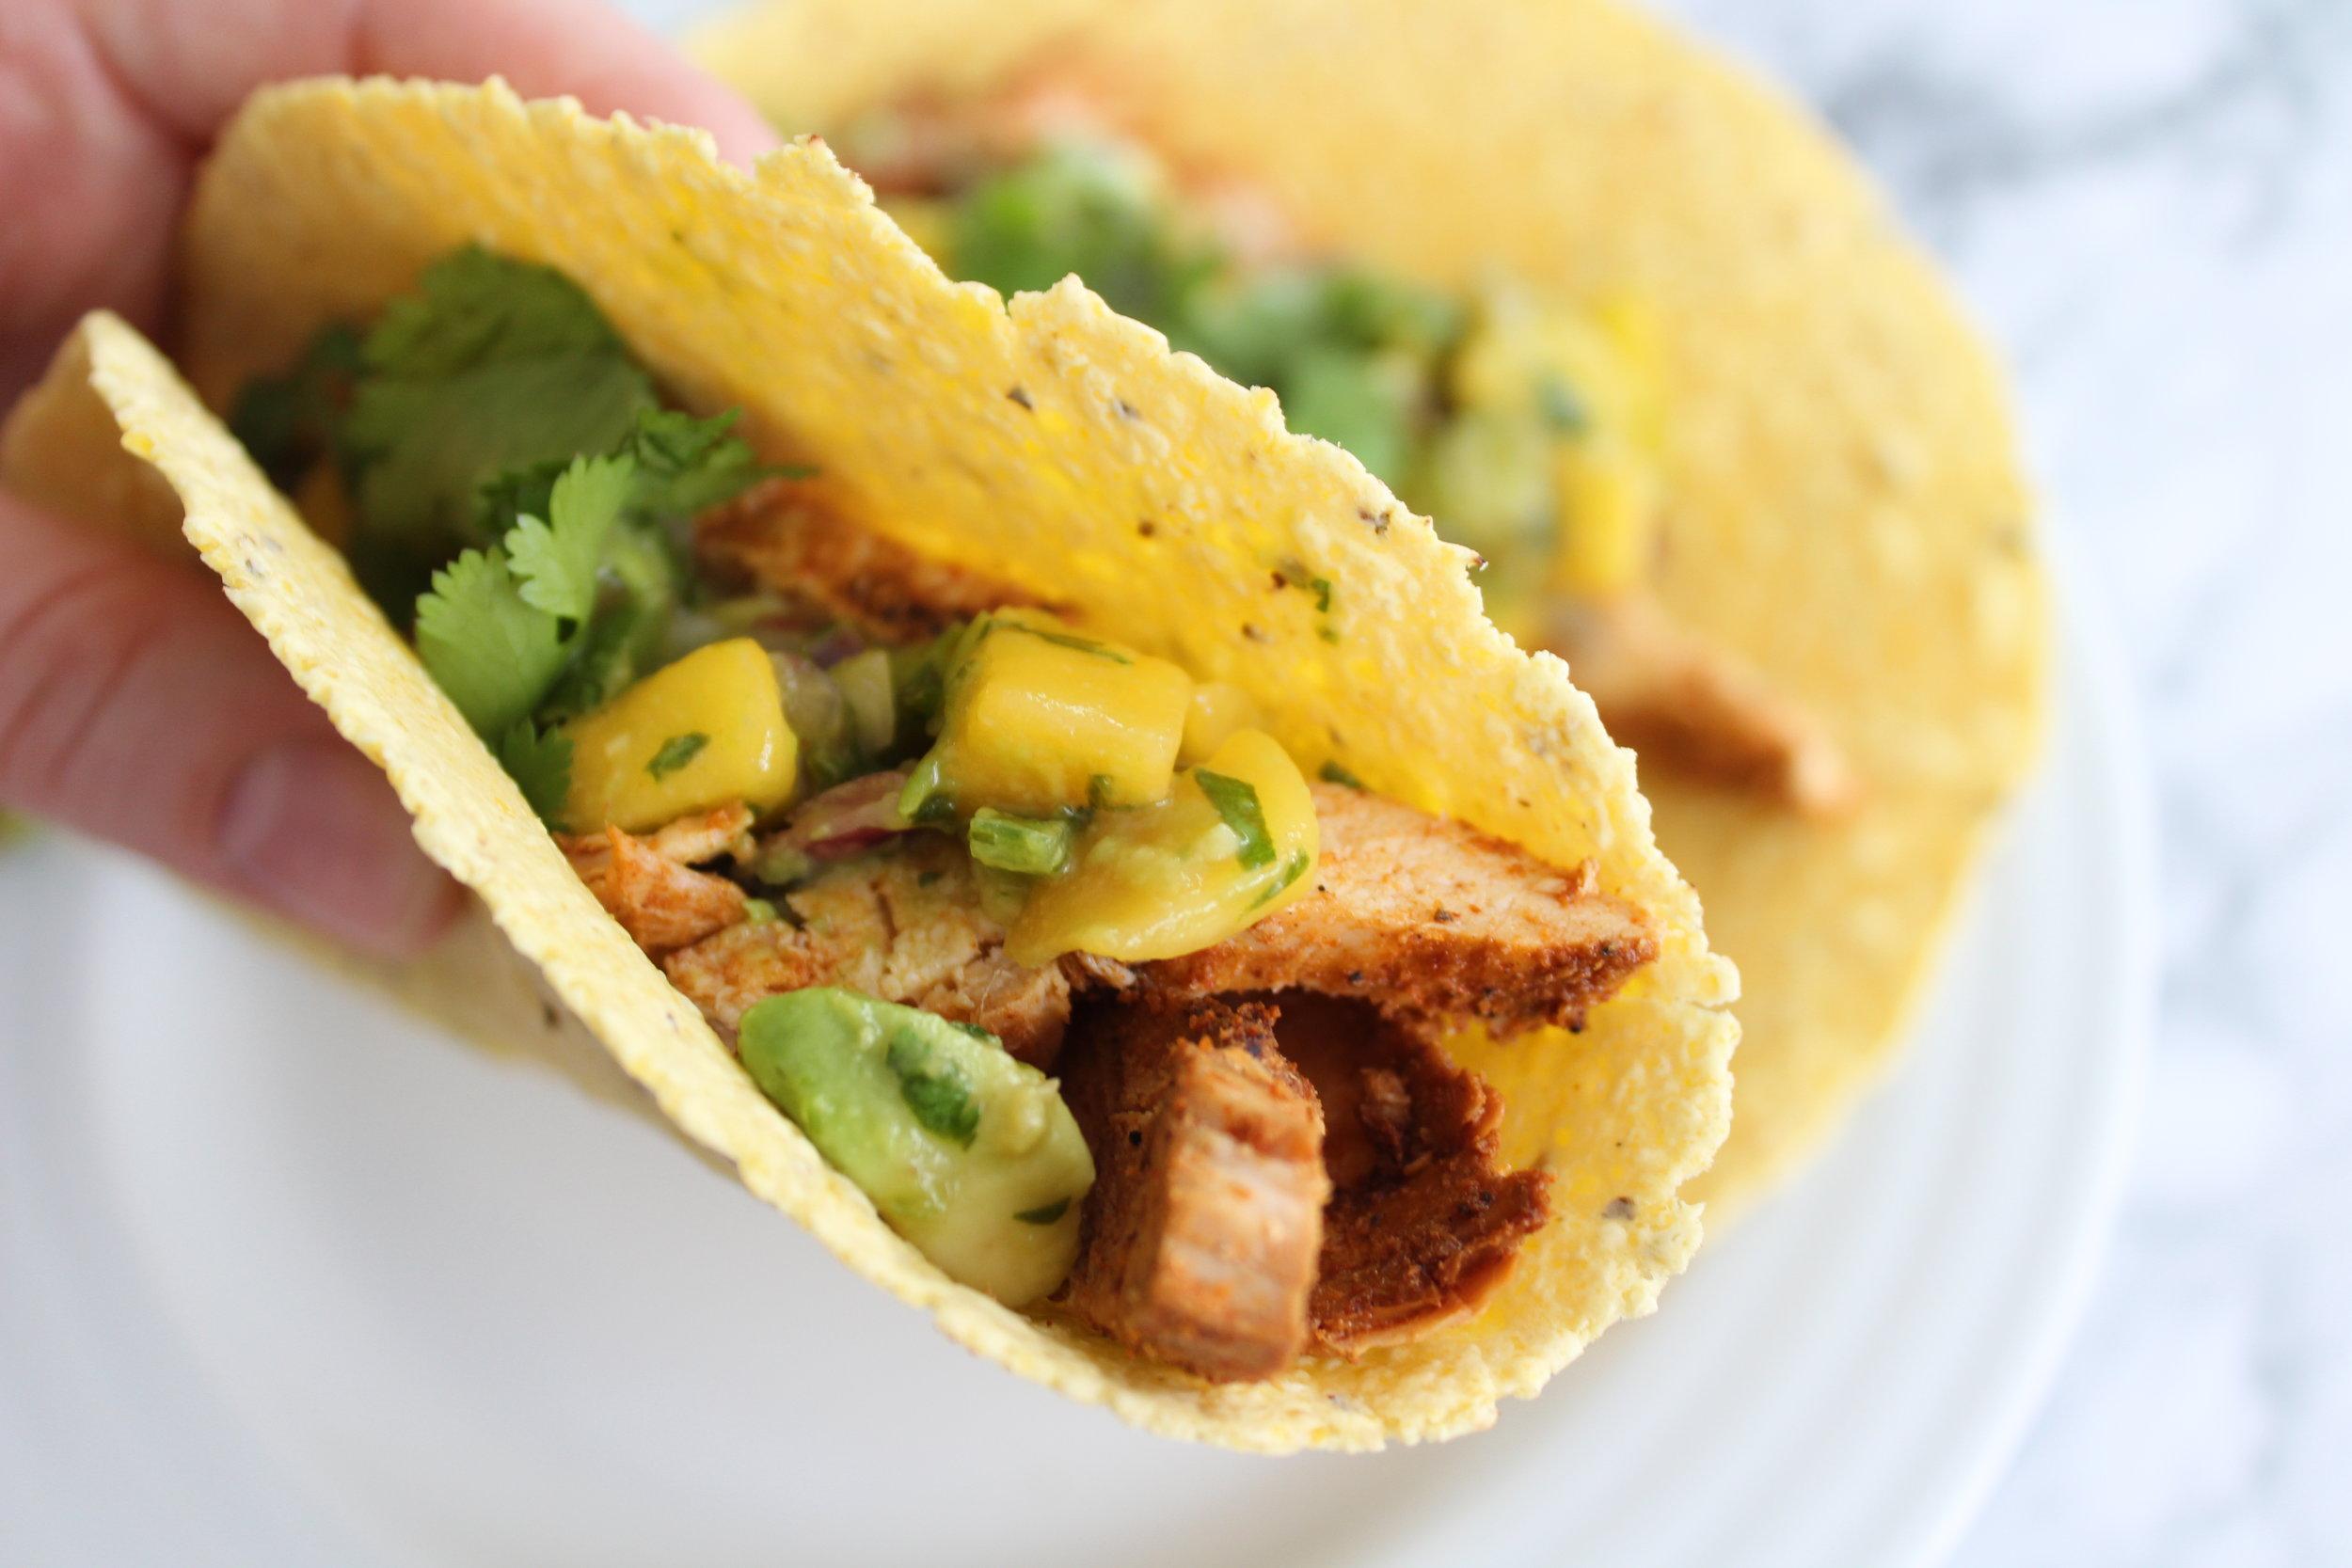 Chili Lime Chicken Tacos with Mango Avocado Salsa || goodfortheswole.com